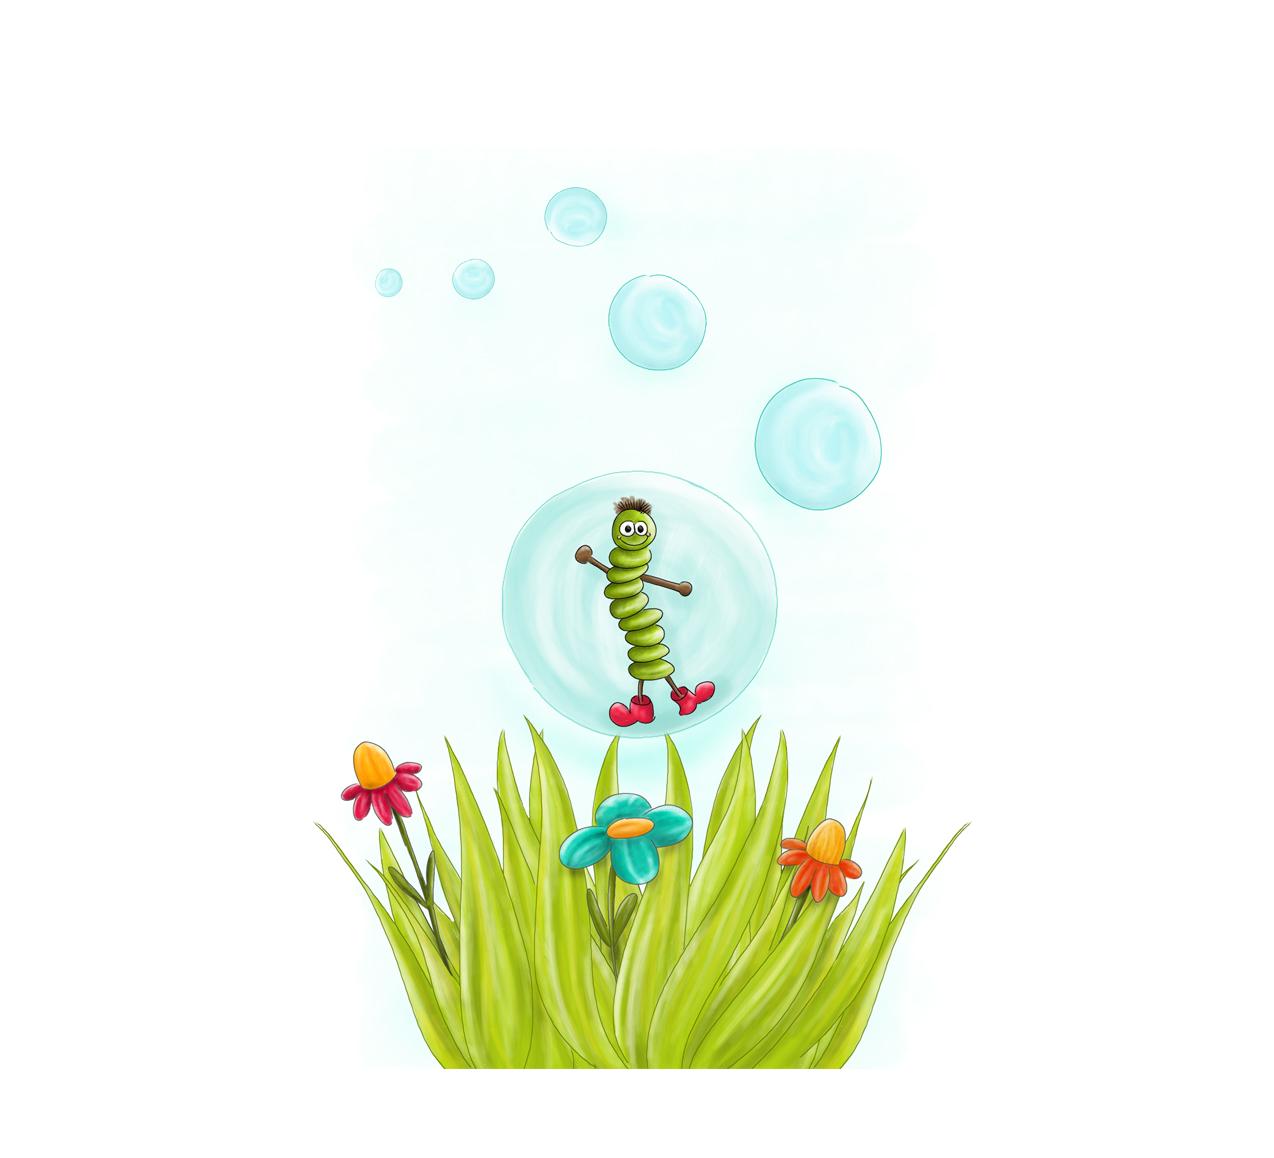 Kinderbuchillustration (digital)